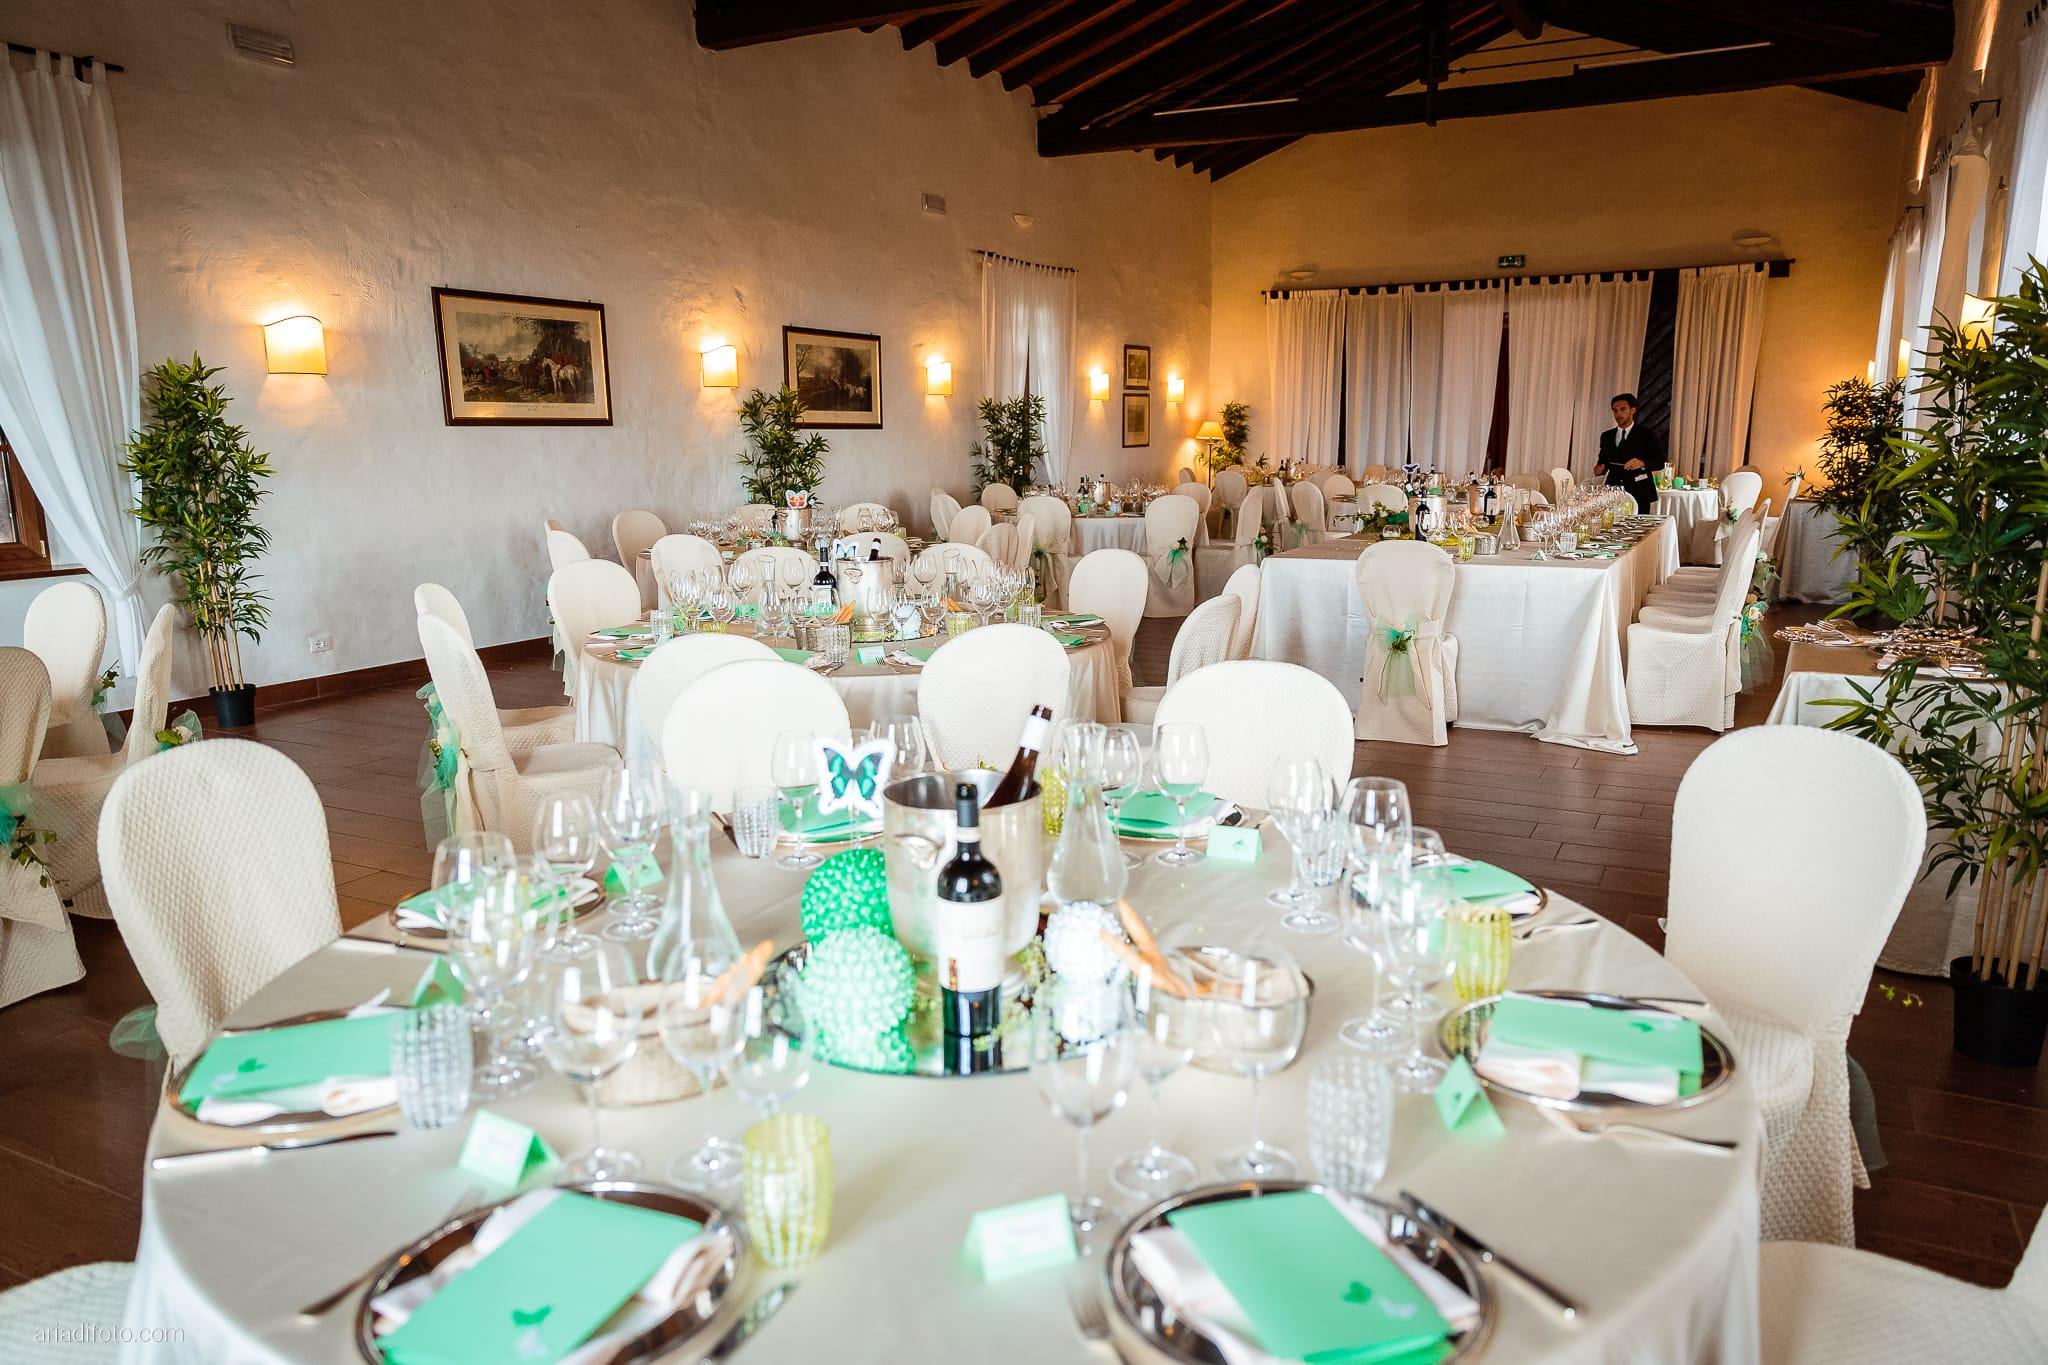 Eleonora Elia Matrimonio Tarcento Udine Baronesse Tacco Gorizia ricevimento dettagli sala decorazioni allestimenti